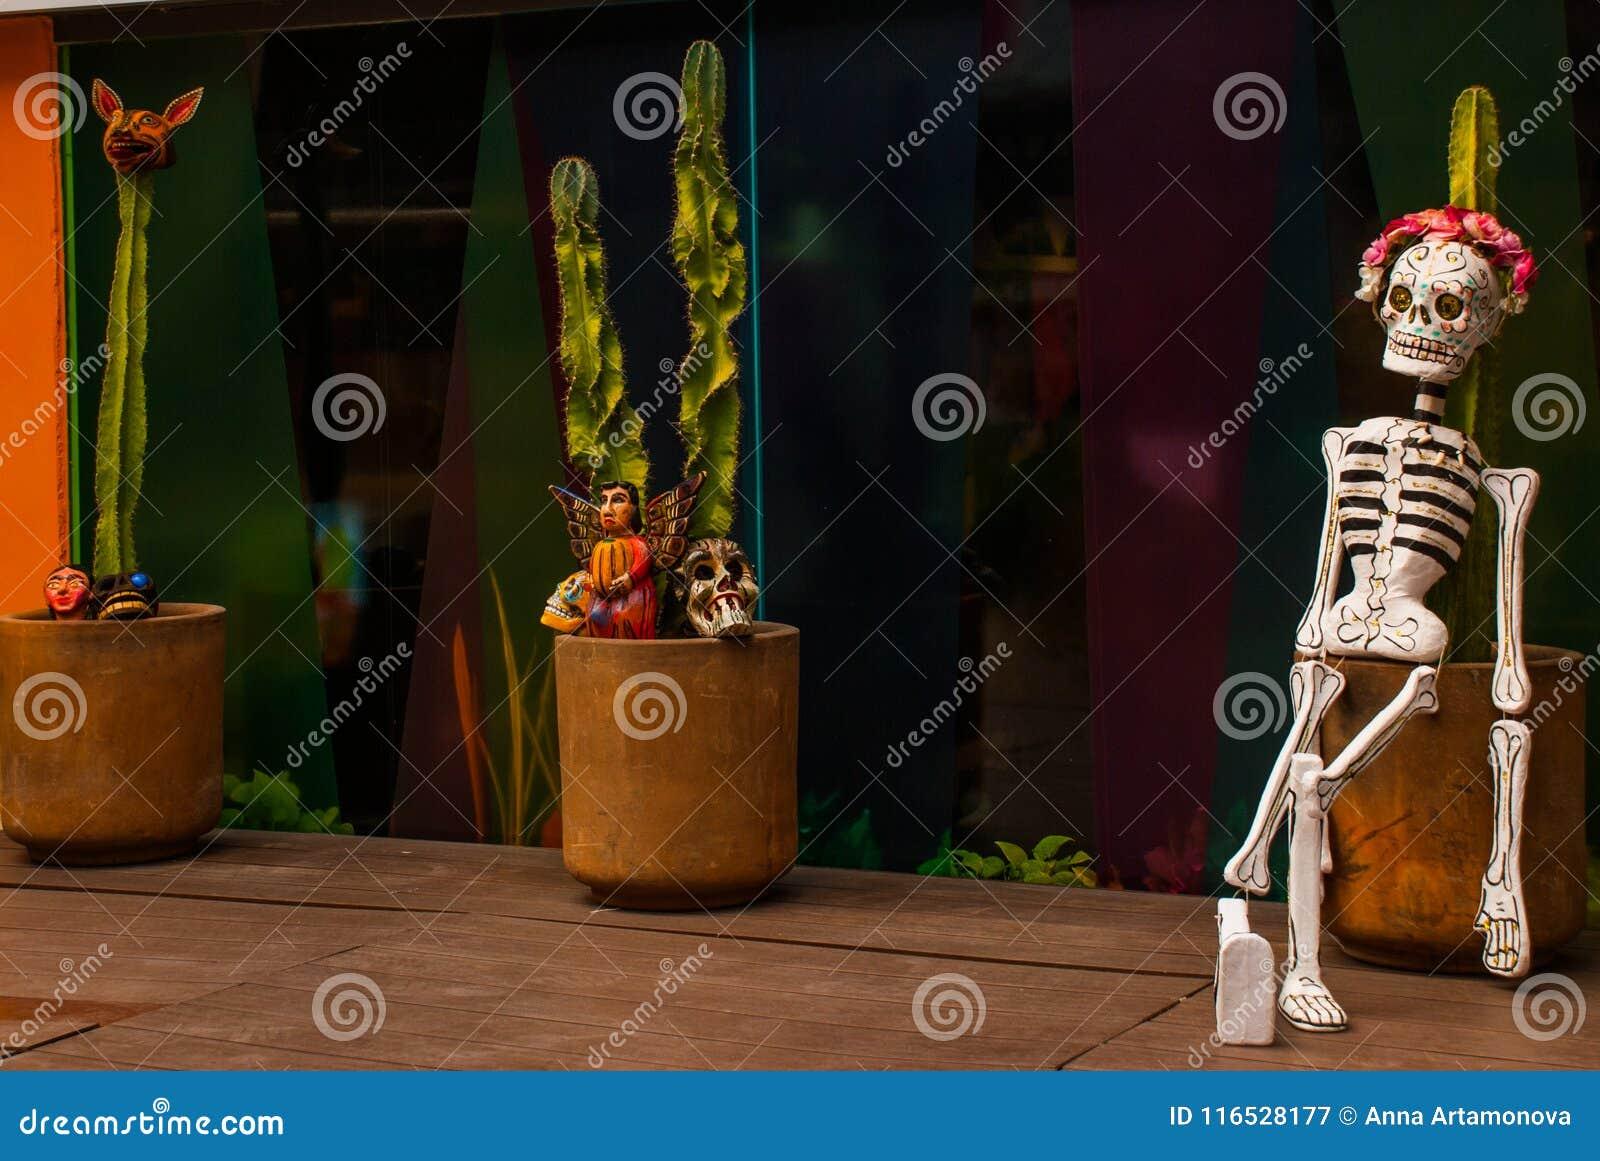 Playa Del Carmen, Mexico, Riviera Maya: Cactus In The Pot